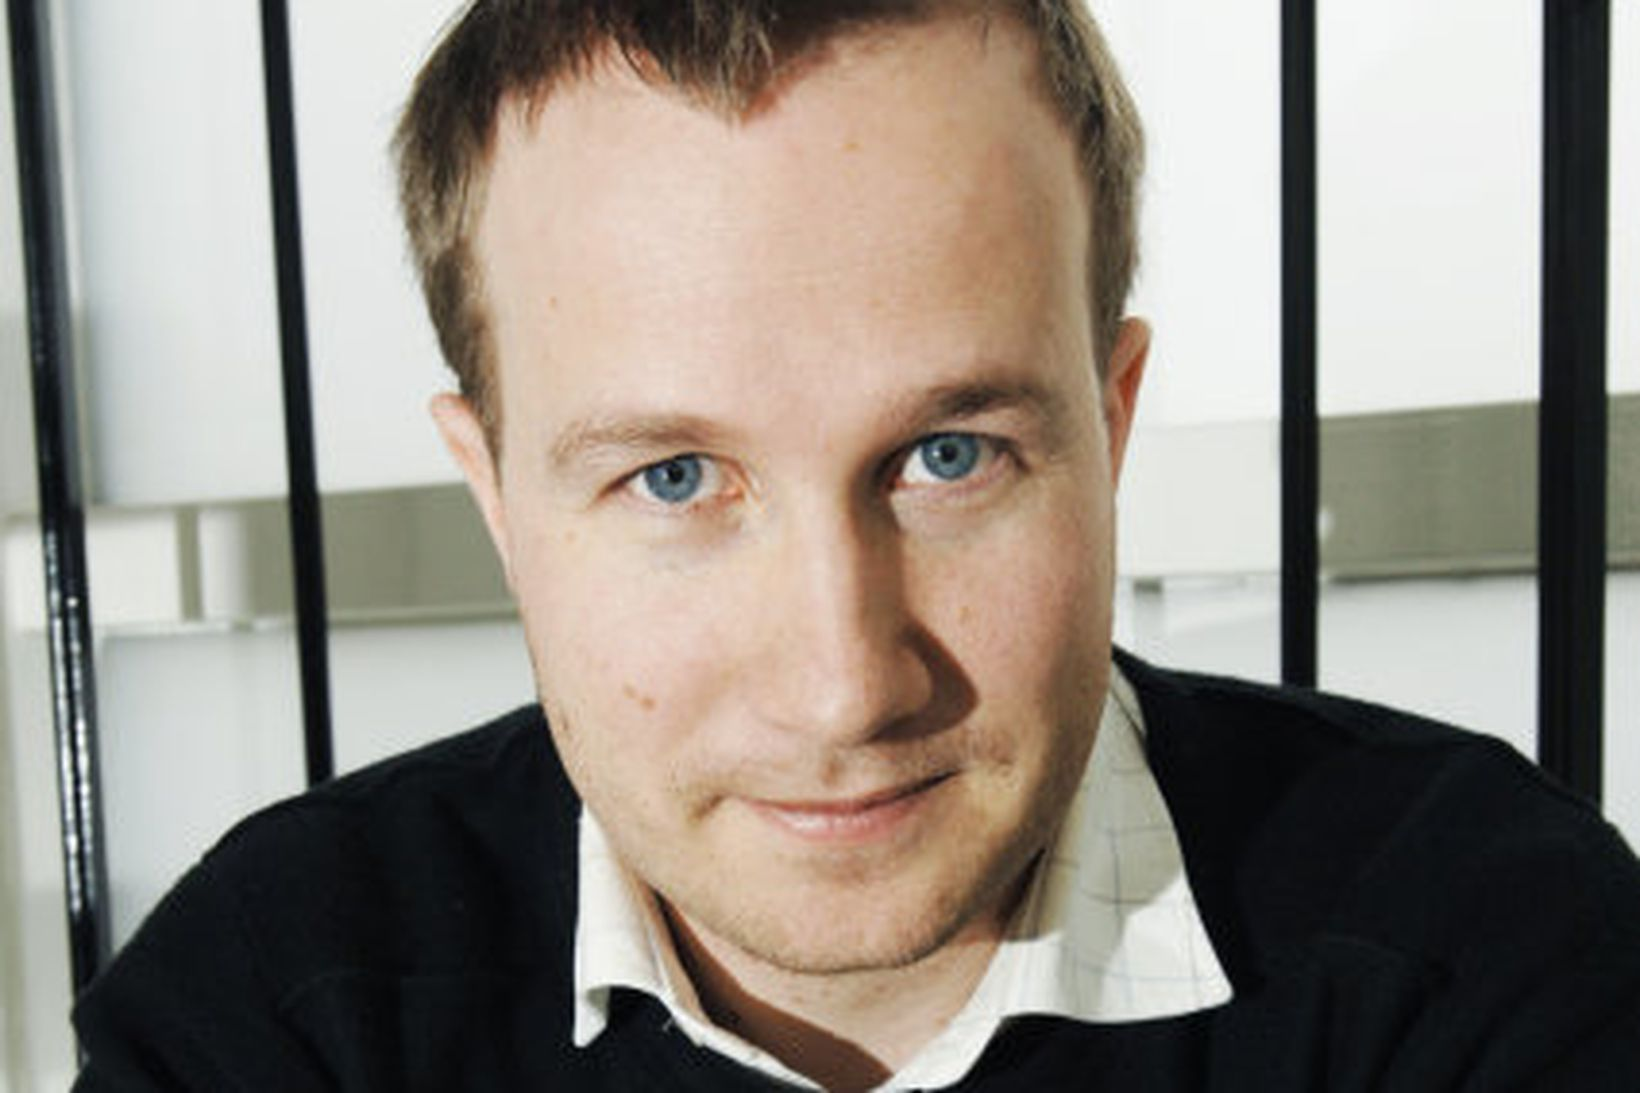 Andri Snær Magnason rithöfundur.